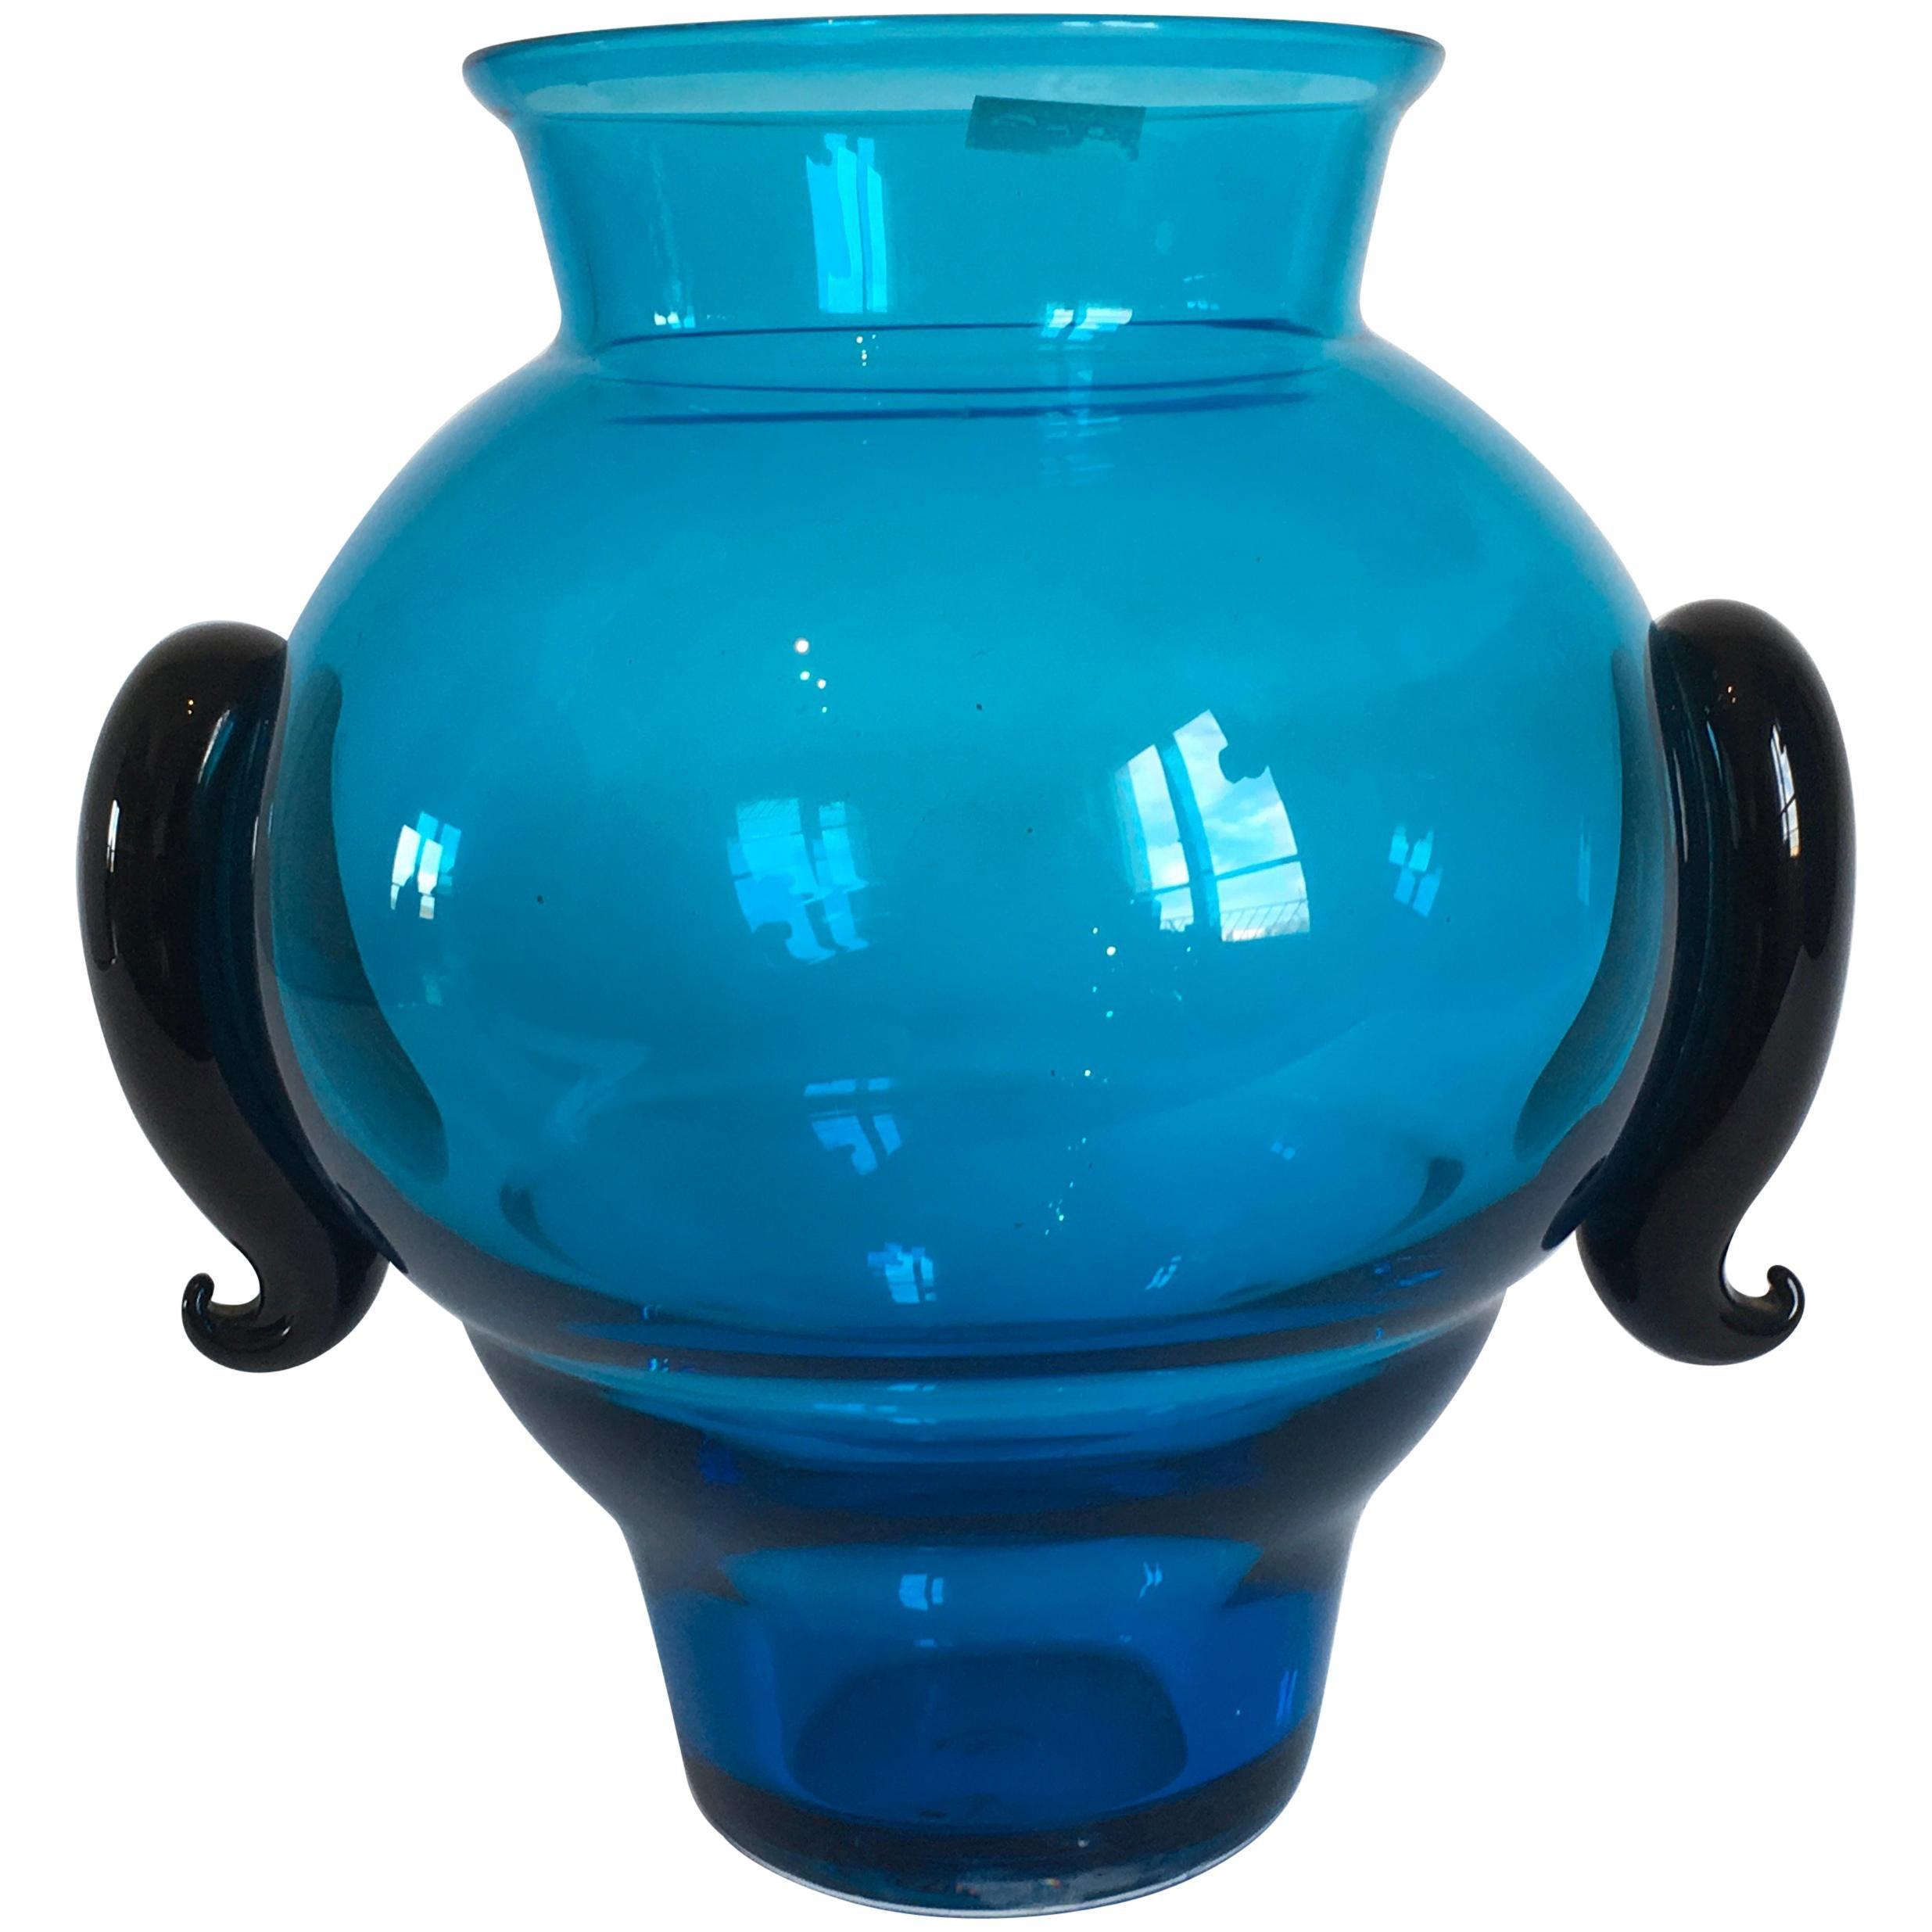 Murano Glass Vase Model Bicorno by Barovier & Toso, Italy